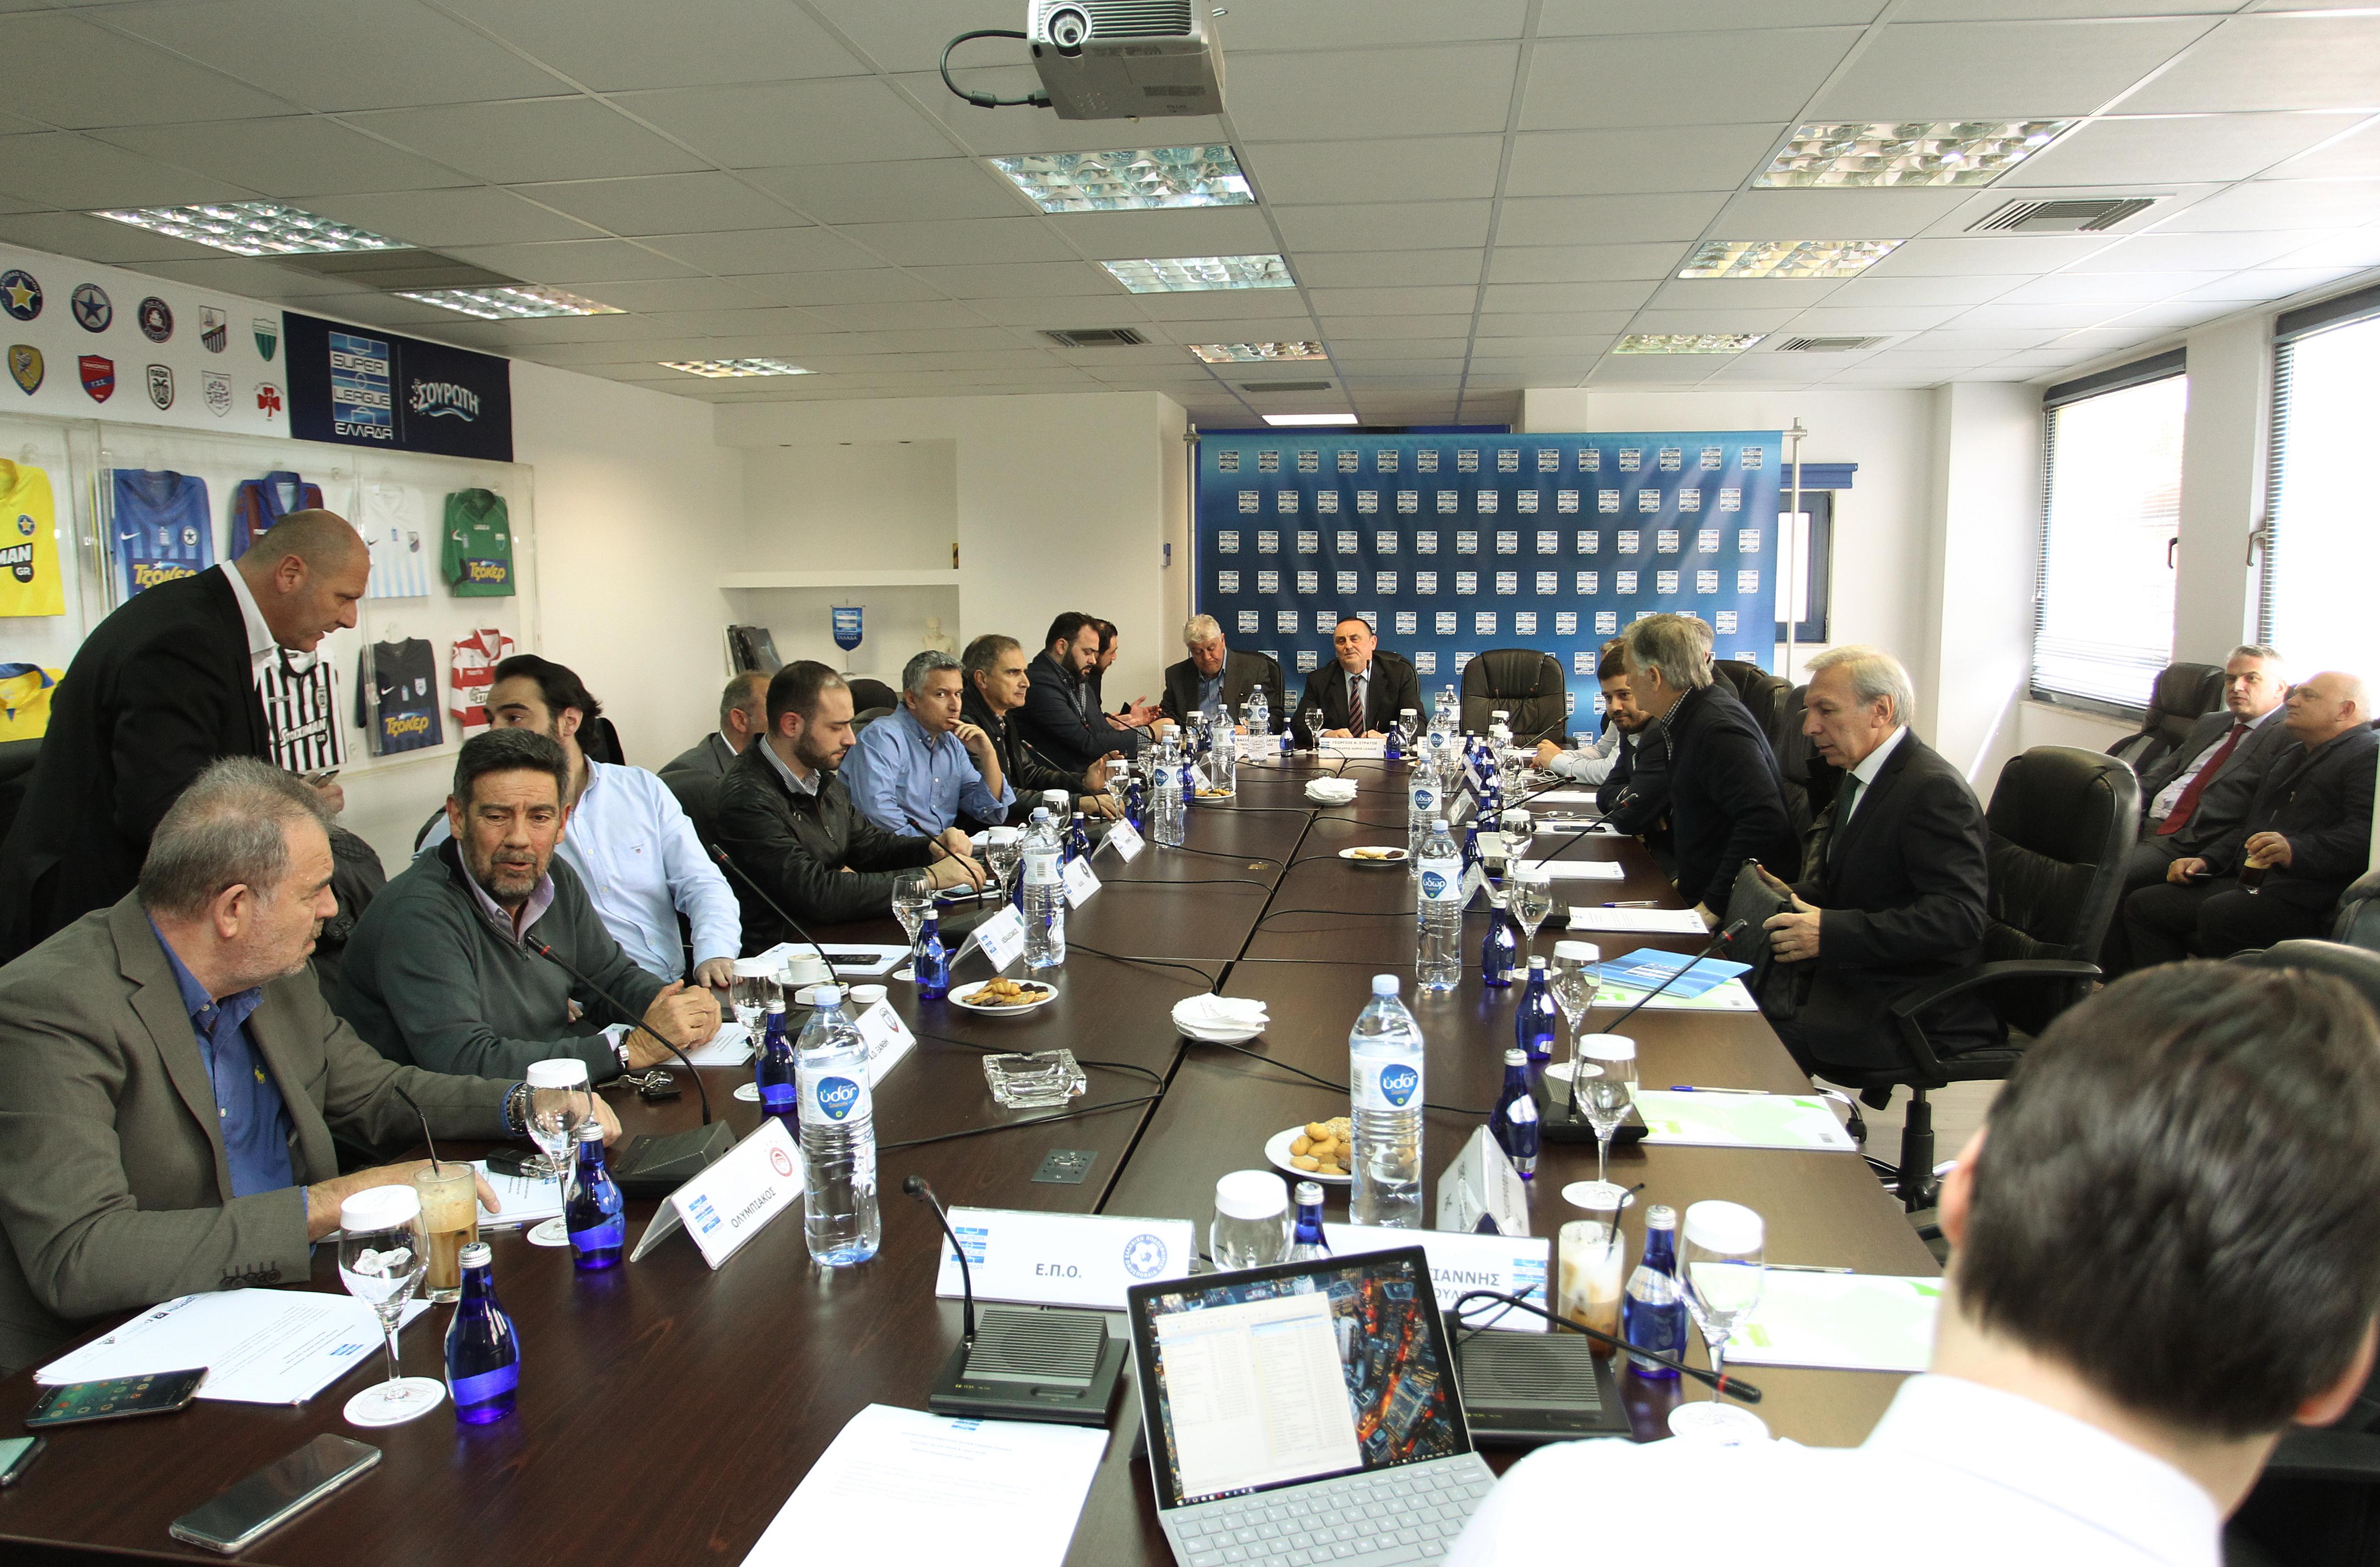 Super League: Αρχίζει το ματς – Βρέθηκε η χρυσή τομή για την τηλεόραση | tovima.gr